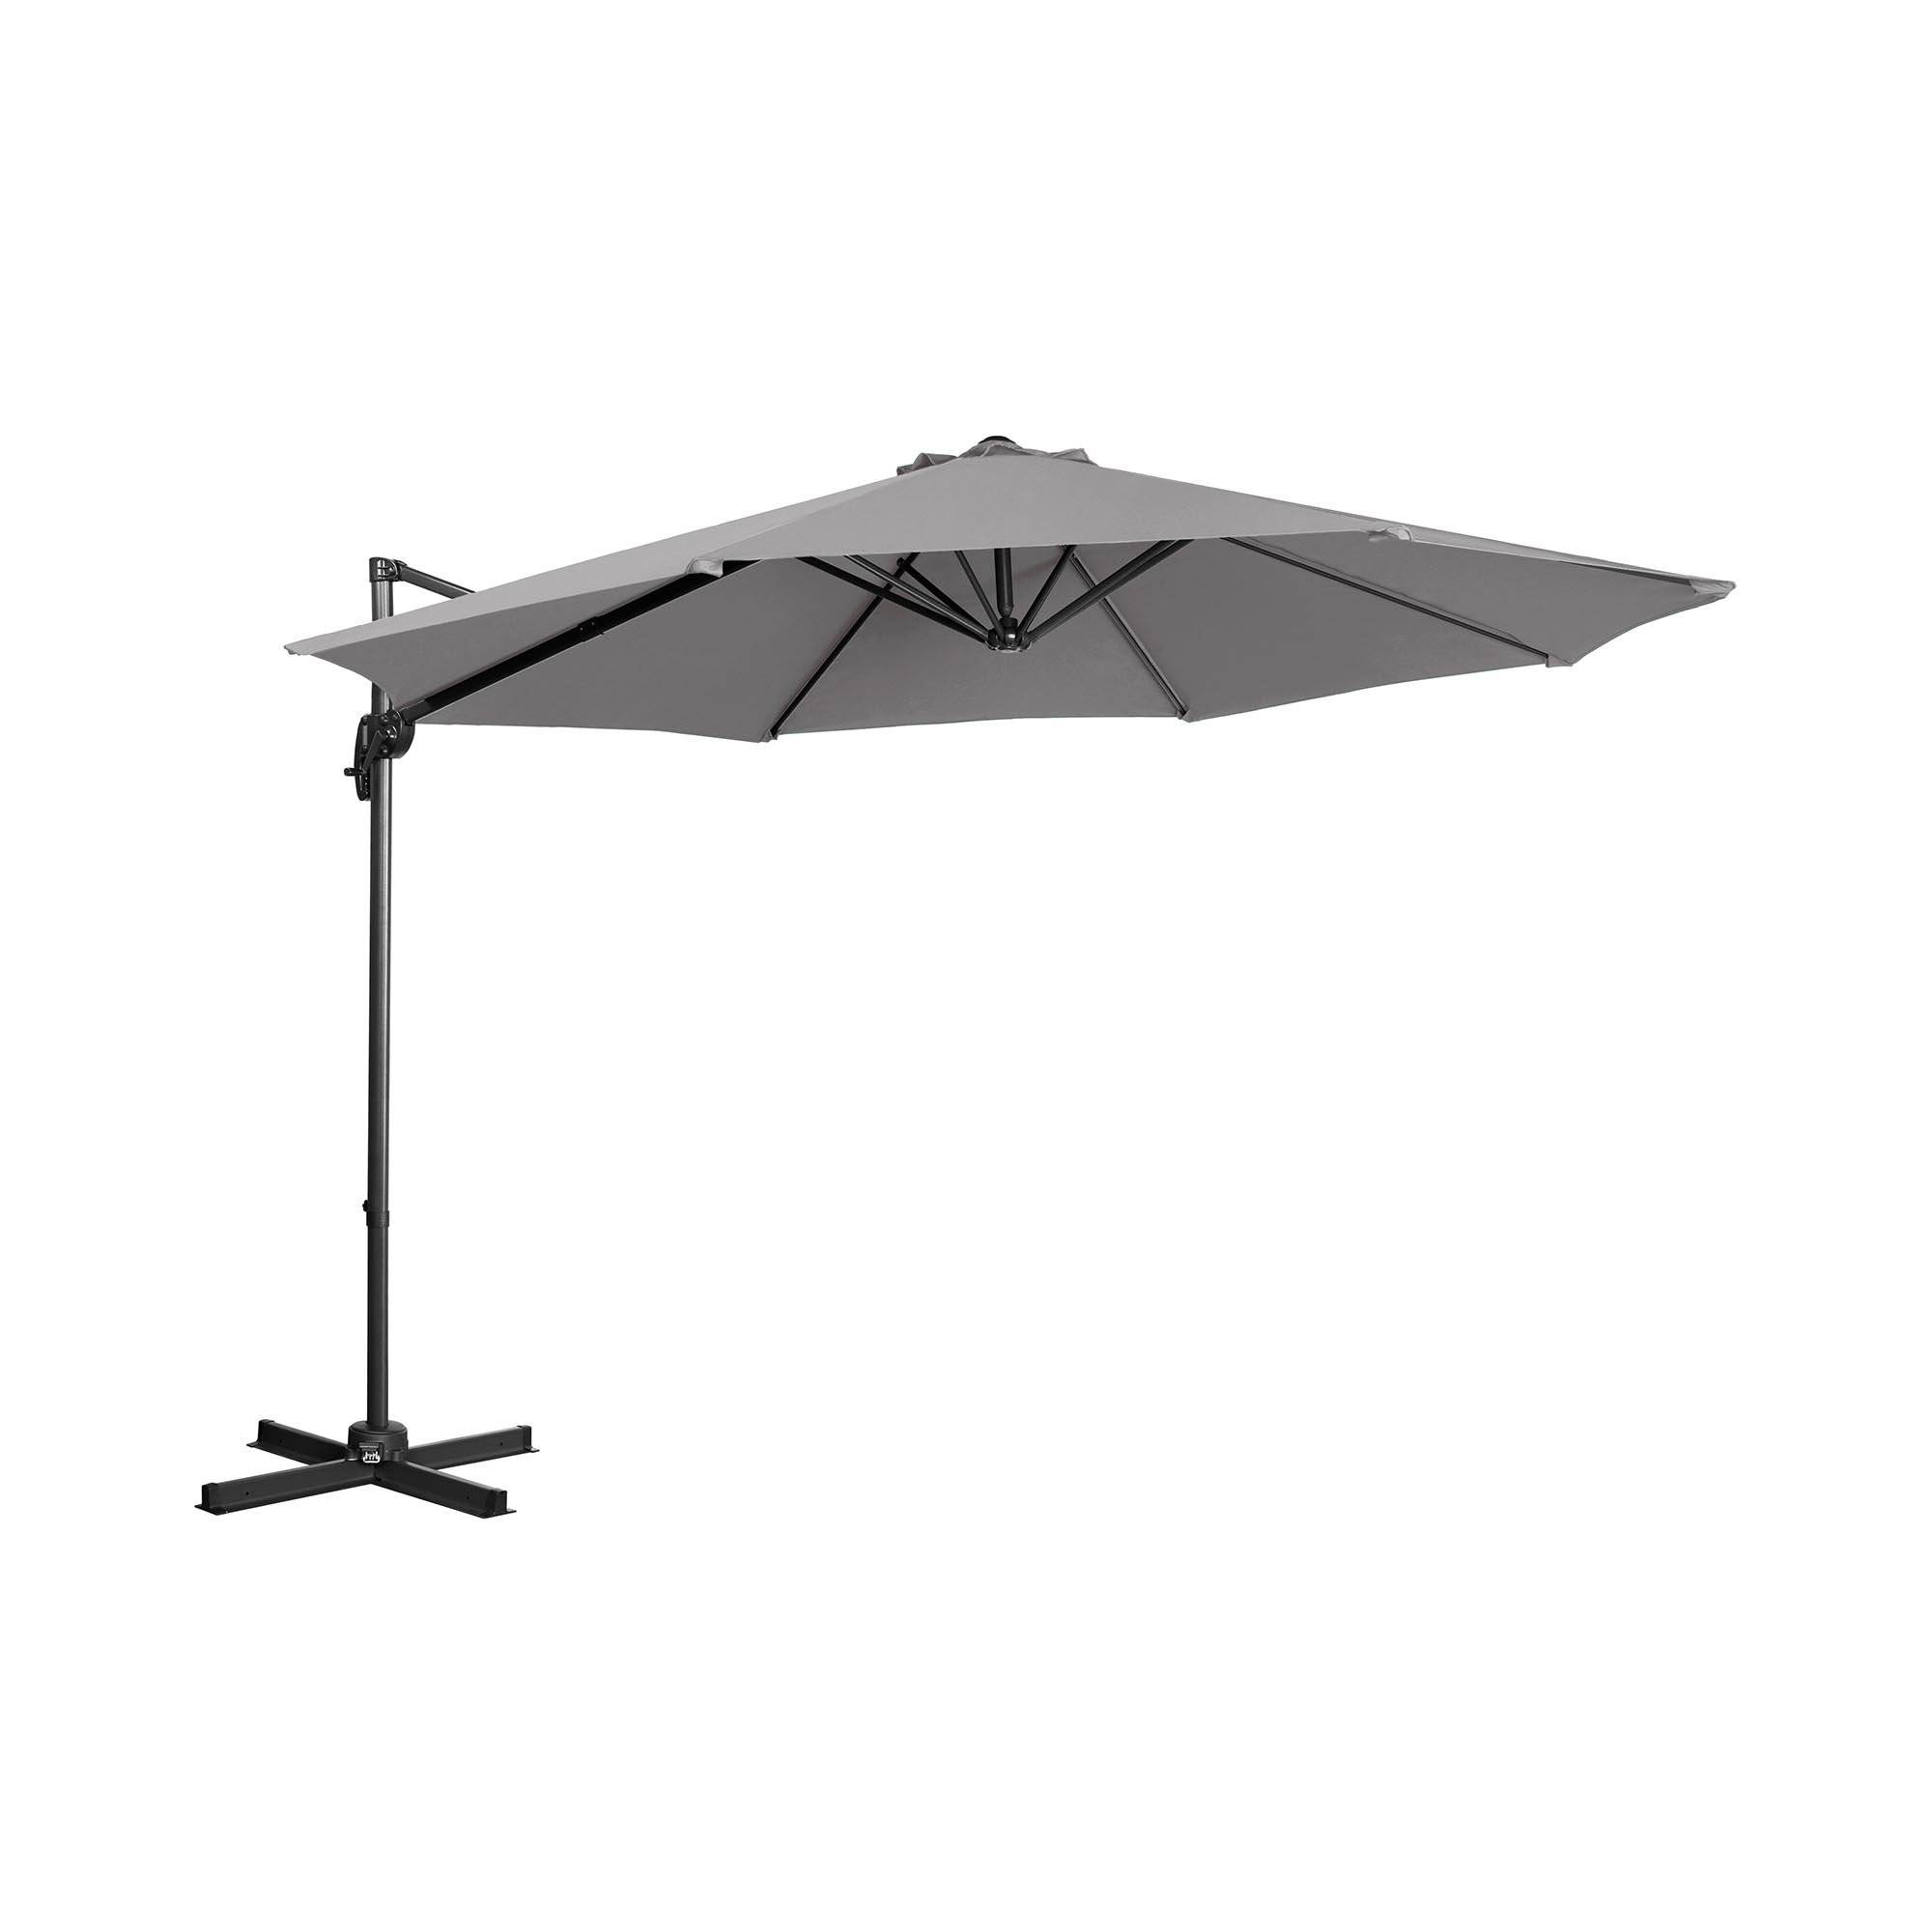 Uniprodo Parasol de jardin - Anthracite - Rond - Ø 300 cm - Pivotant UNI_UMBRELLA_2R300DG